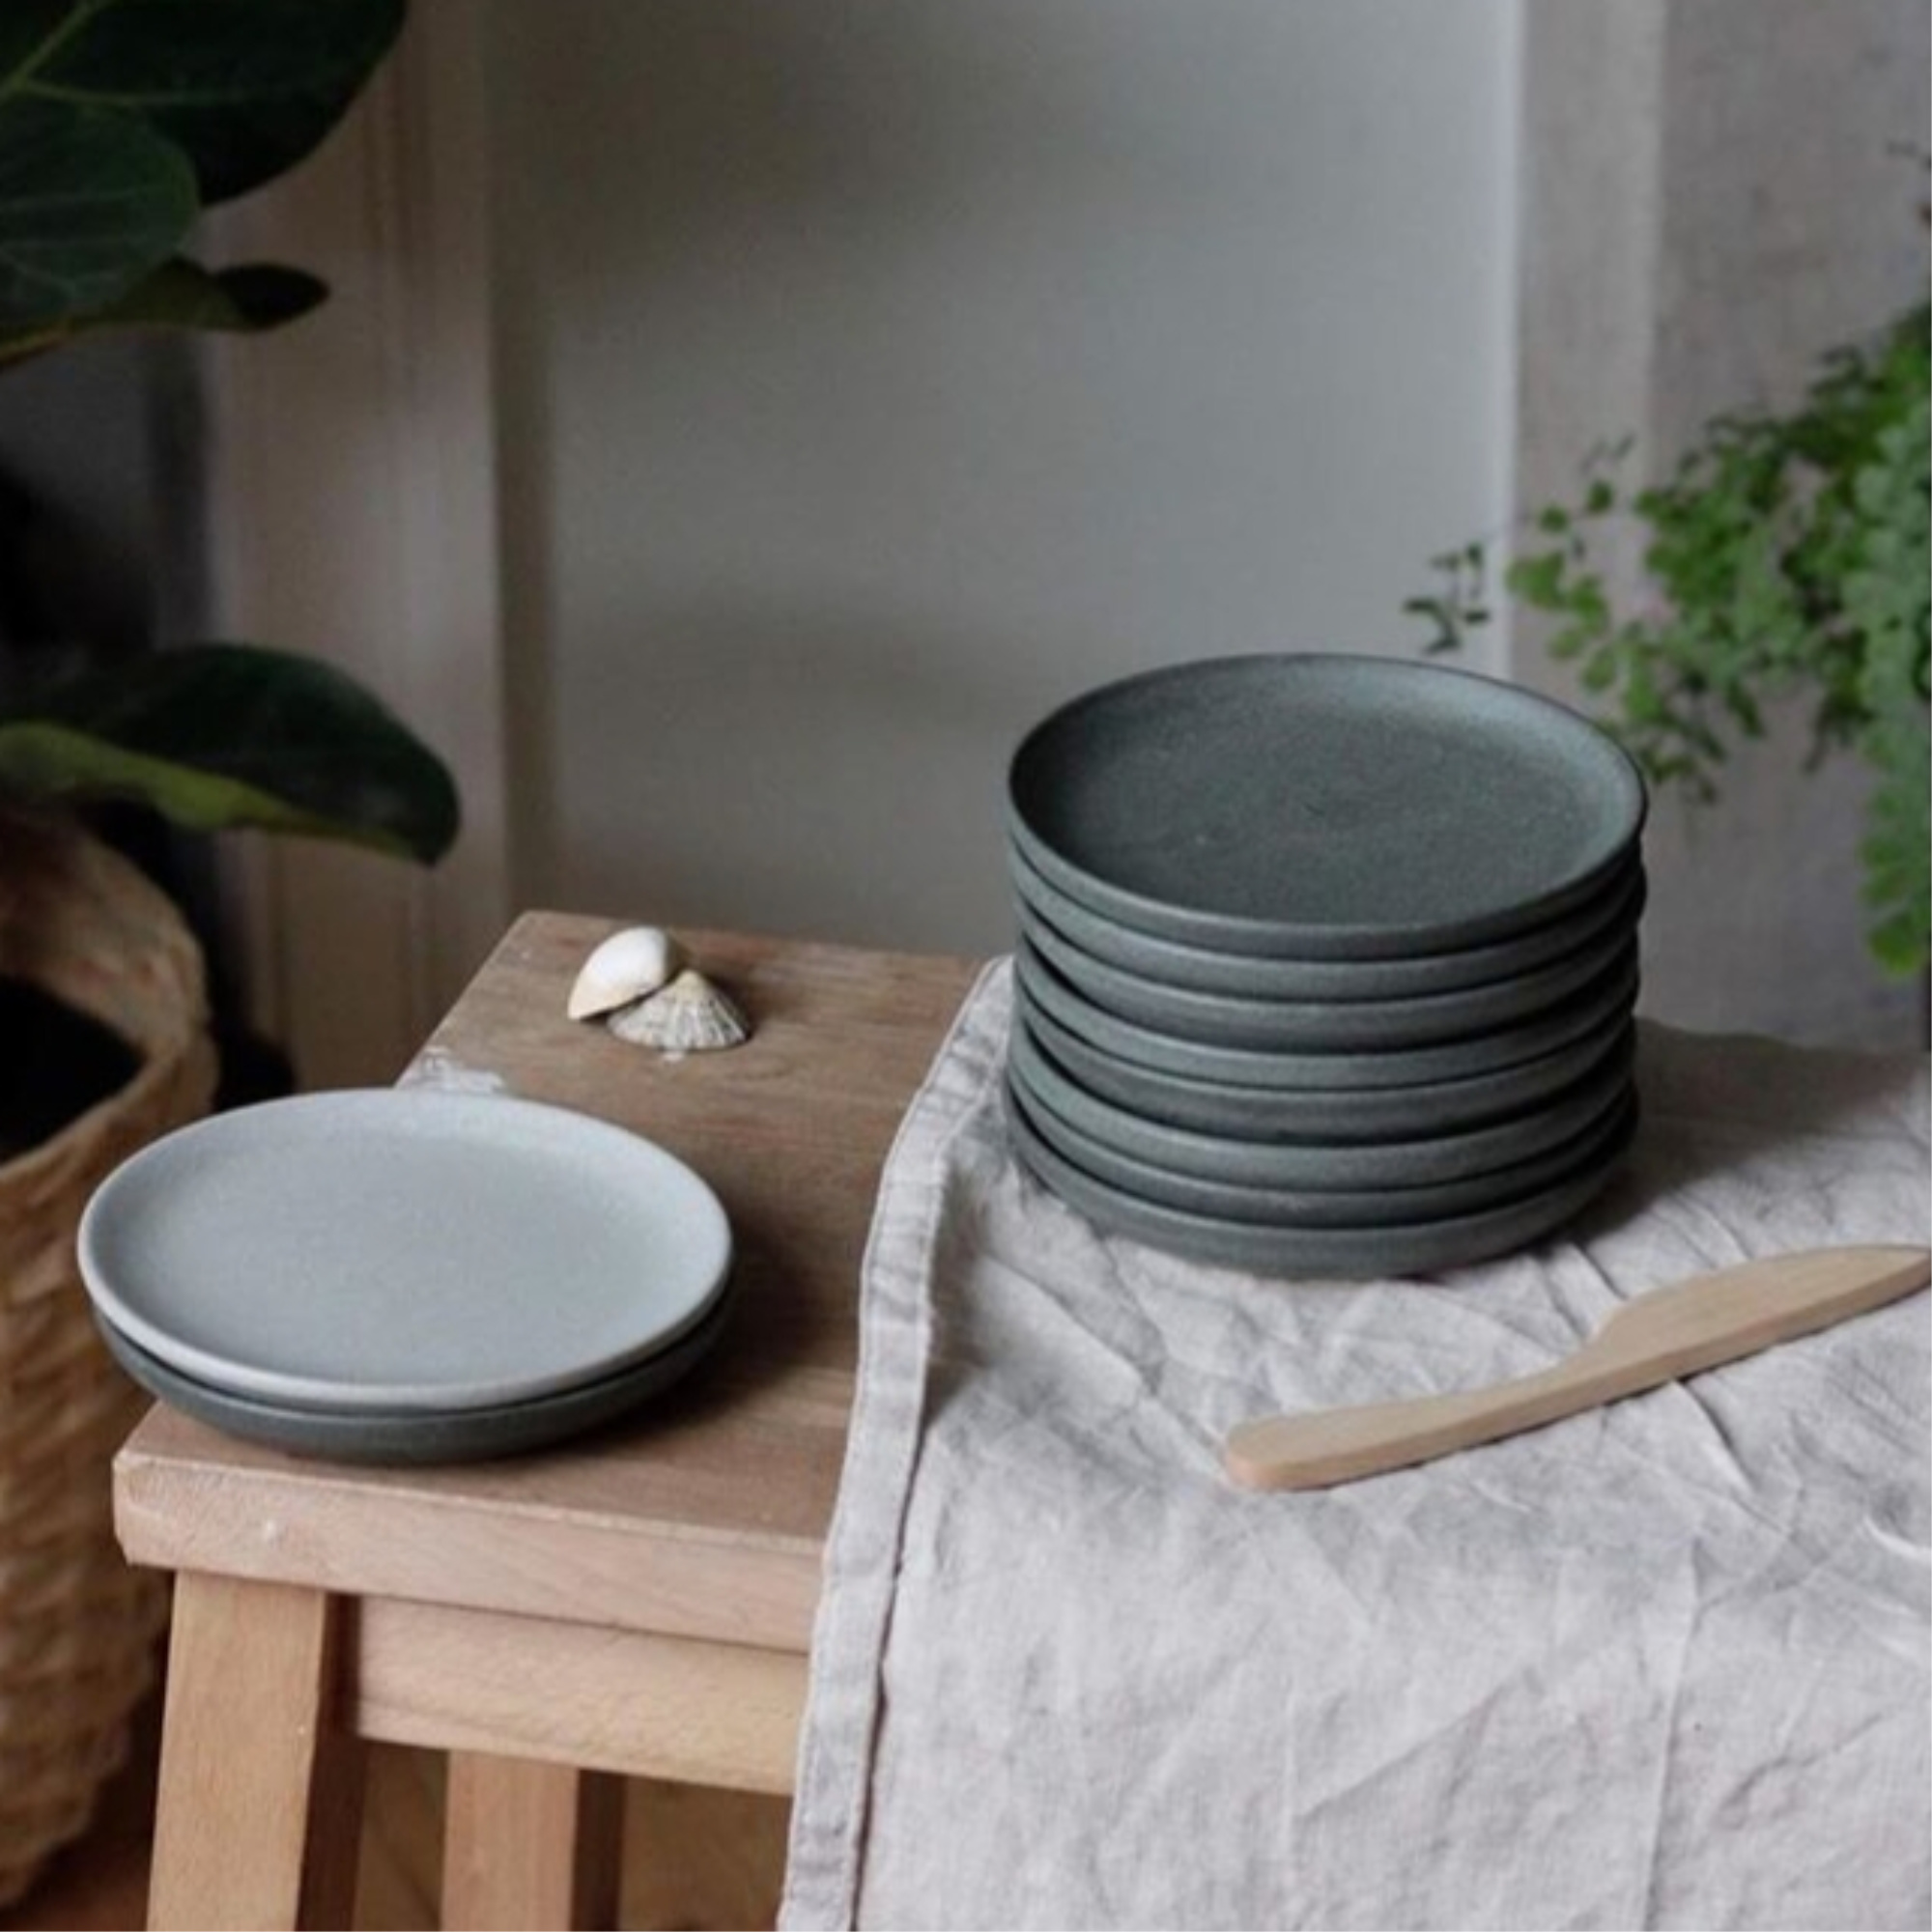 Plates by Borja Moronta